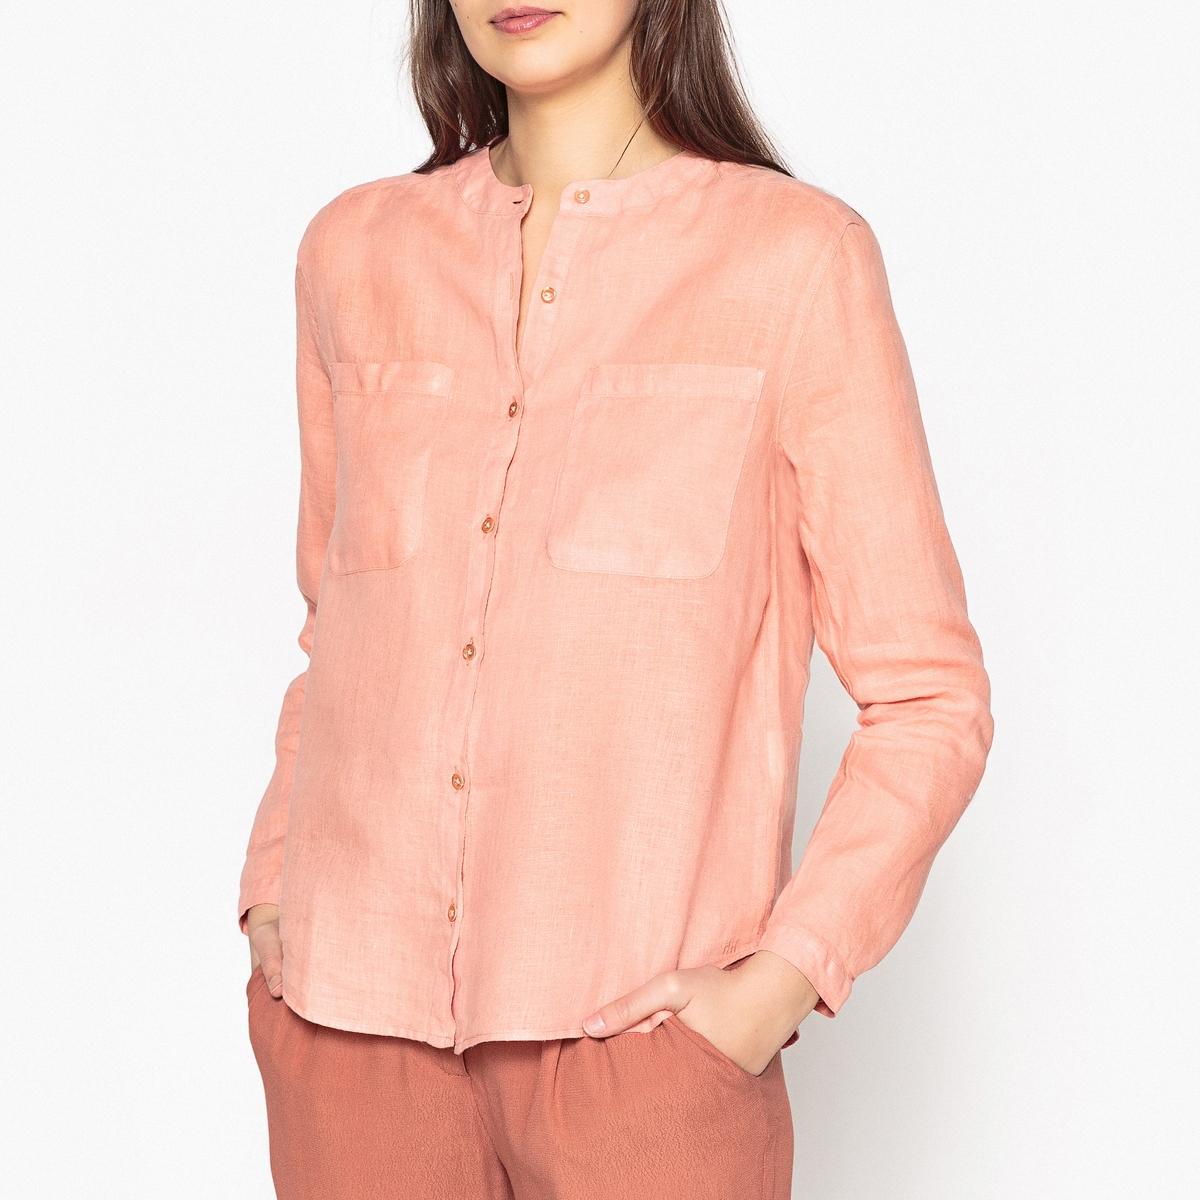 Фото - Рубашка прямого покроя из льна LINEA рубашка однотонная прямого покроя с короткими рукавами 100% лен